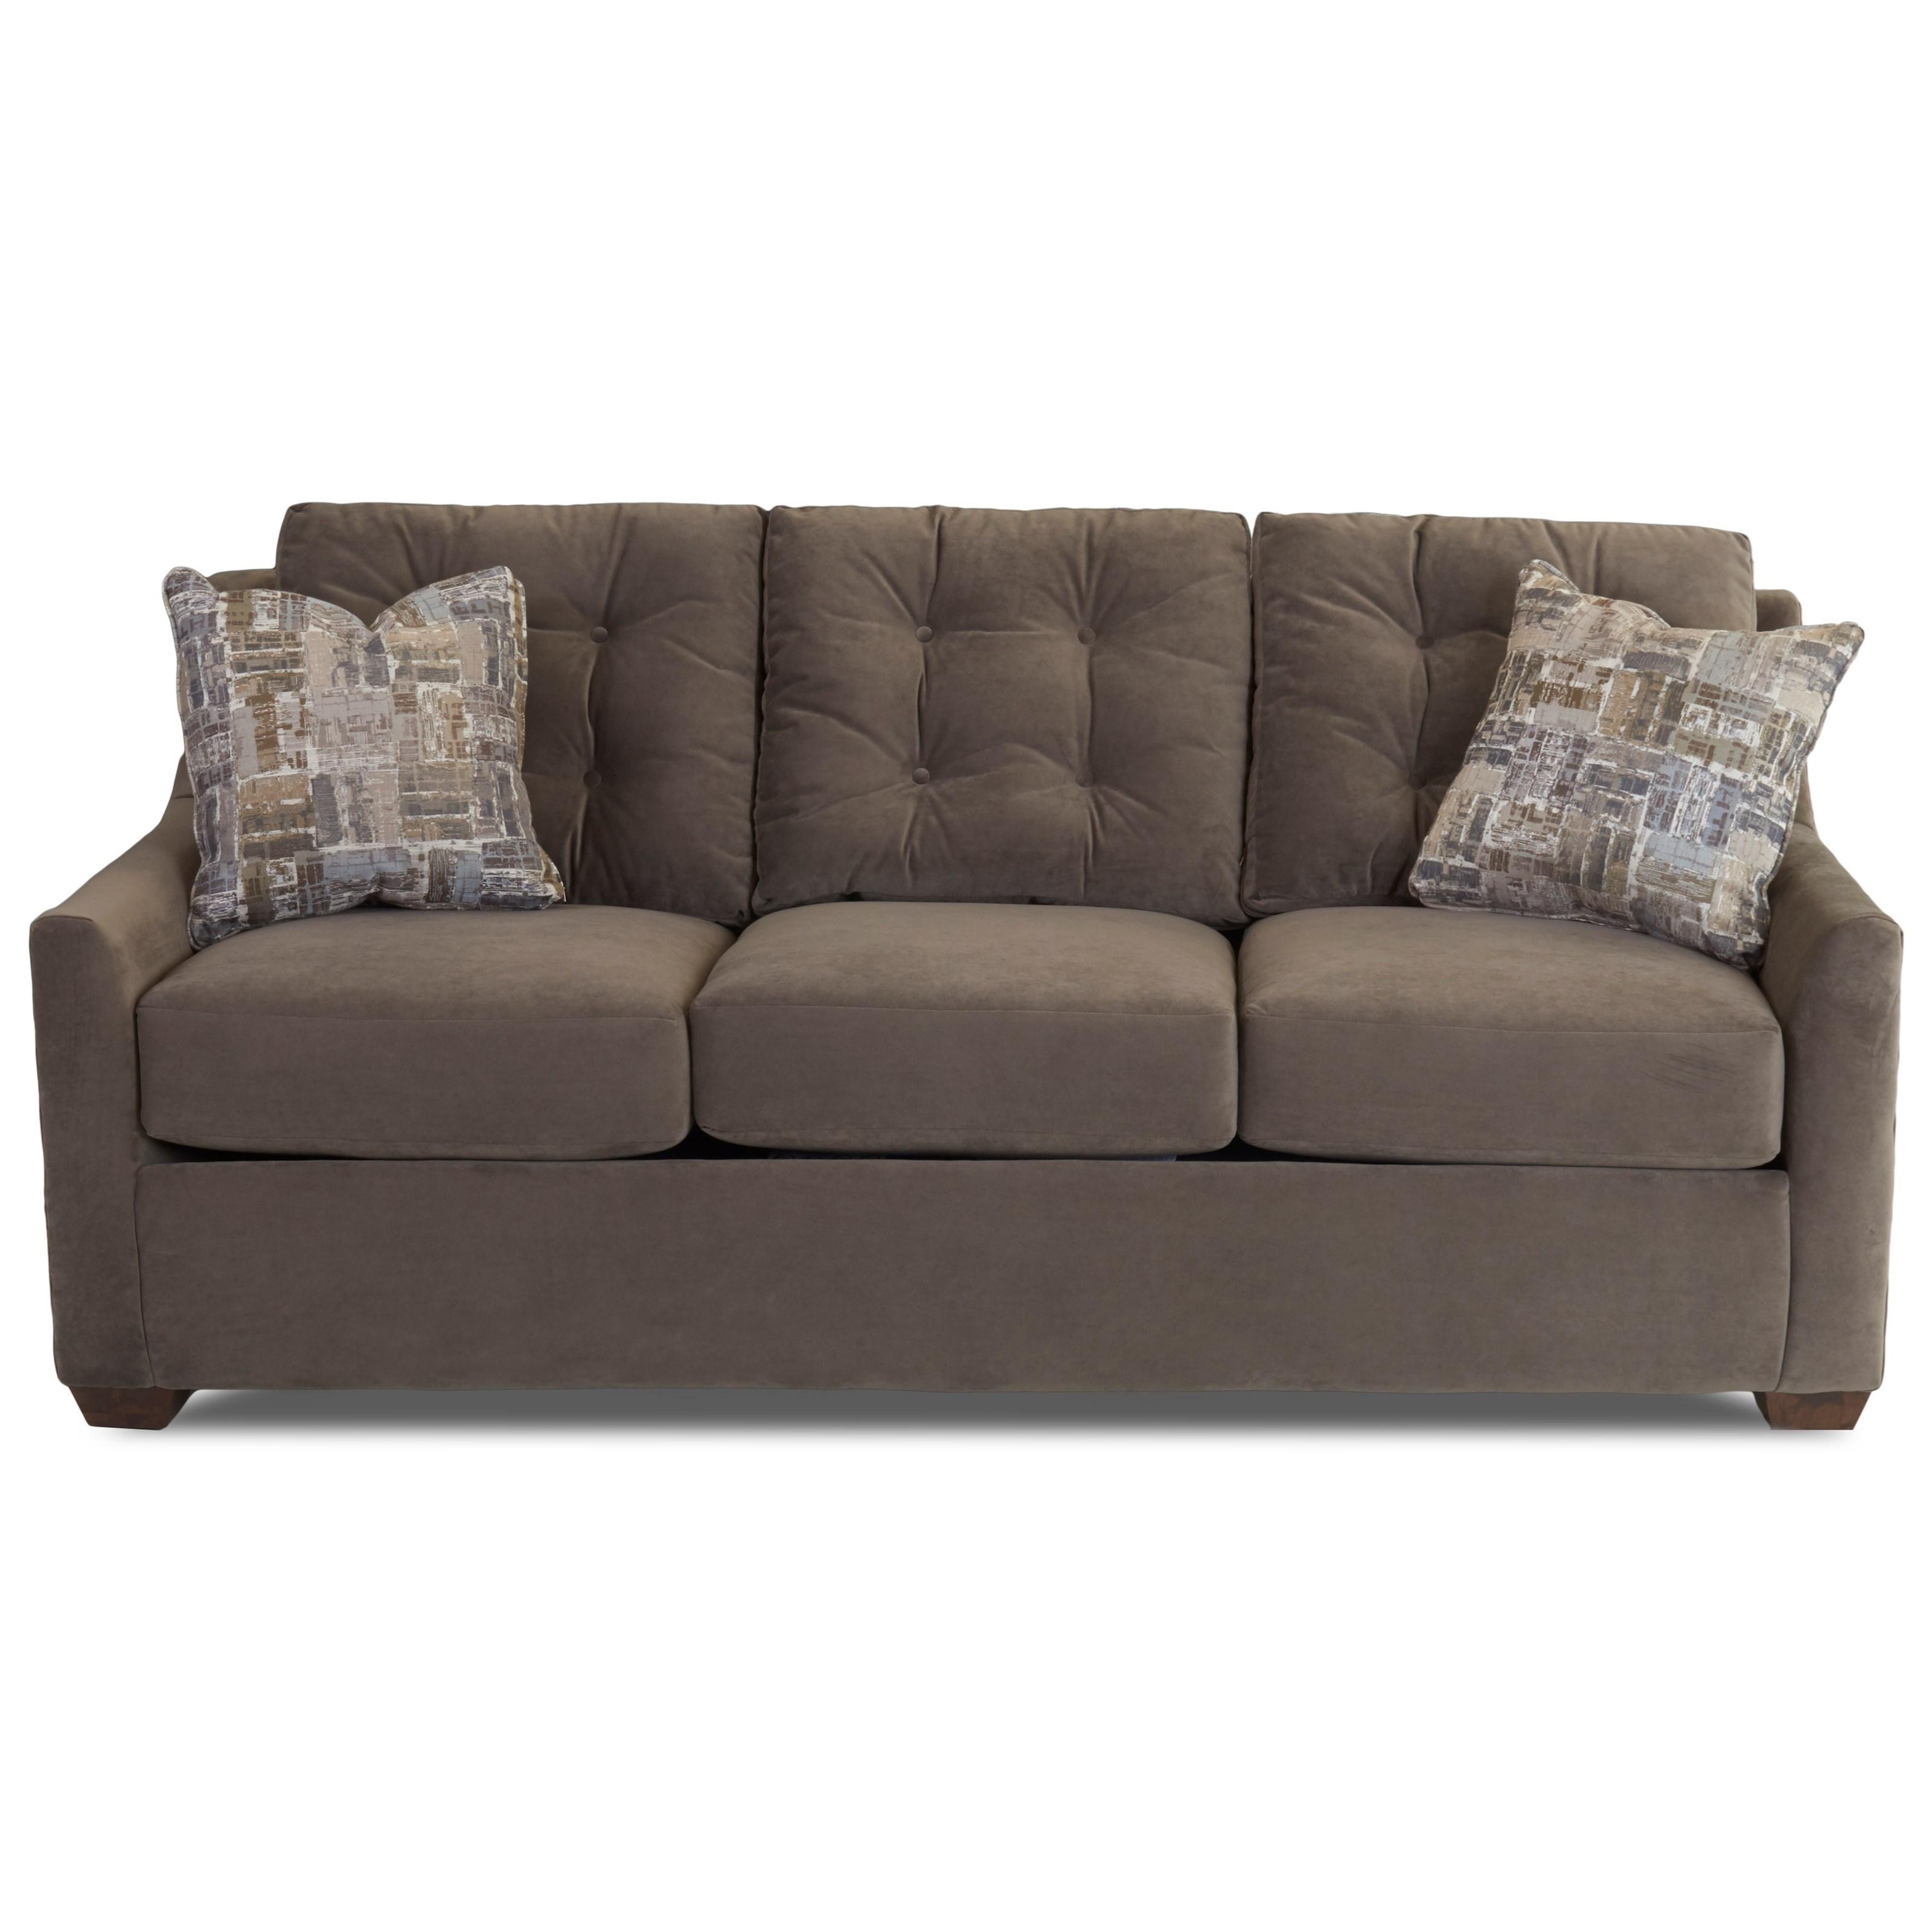 Grayton Queen Innerspring Sleeper Sofa by Klaussner at Johnny Janosik